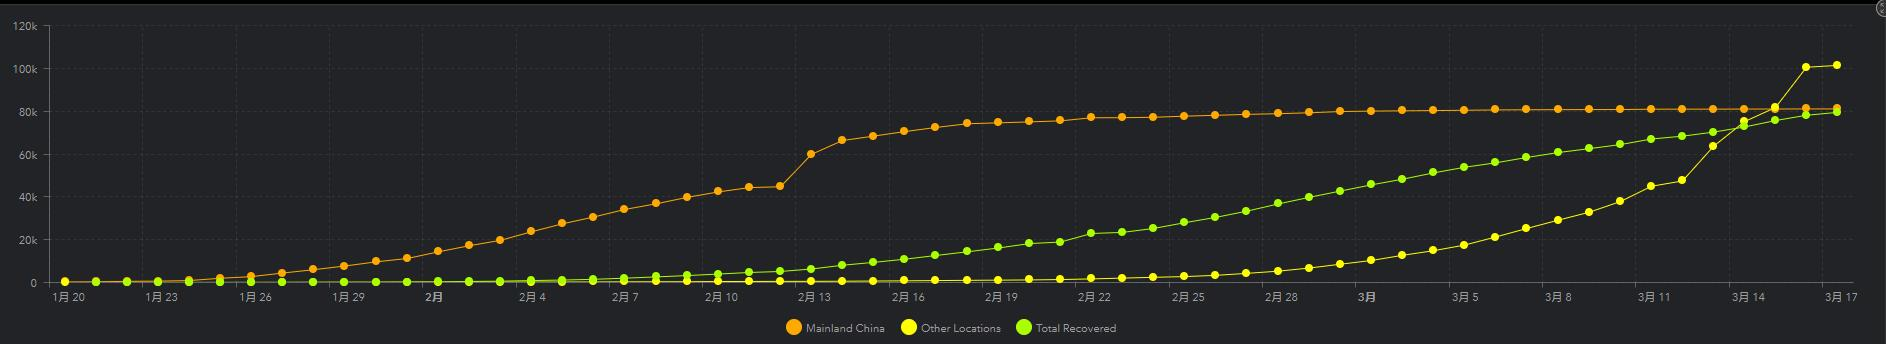 GitHub 标星10k+,新型冠状病毒(2019-nCoV)最全的数据集在这里!